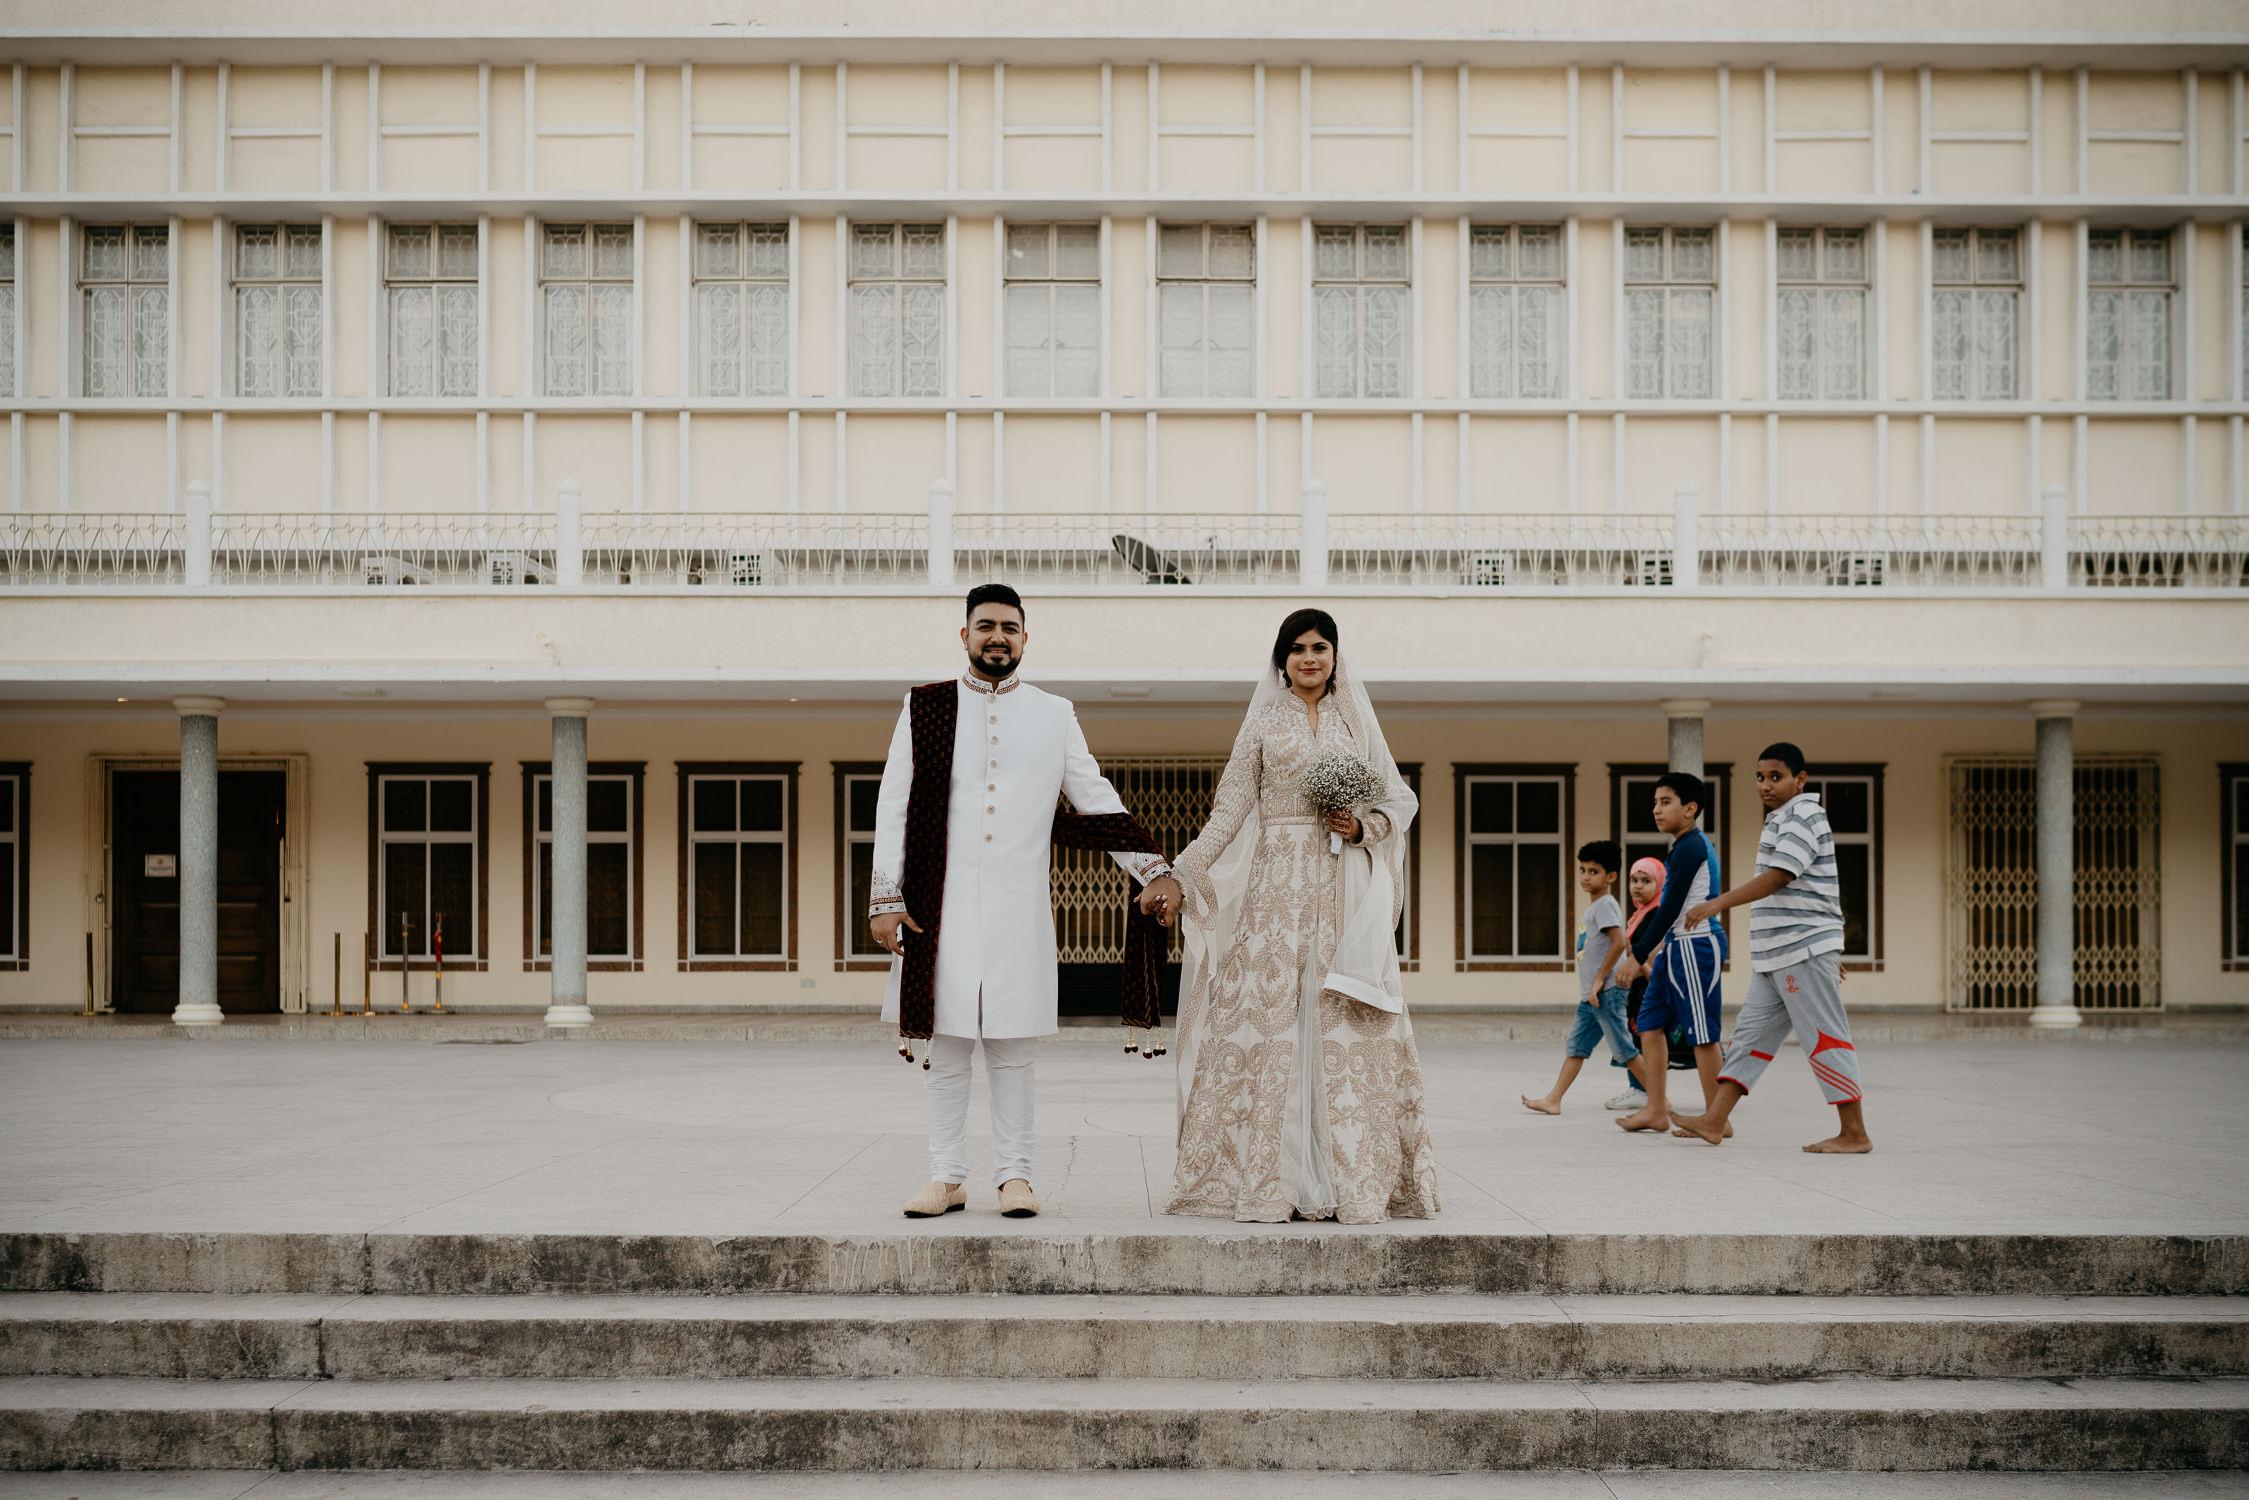 Destination Wedding Photographer Amsterdam to Tanzania // Aqil + Benazir